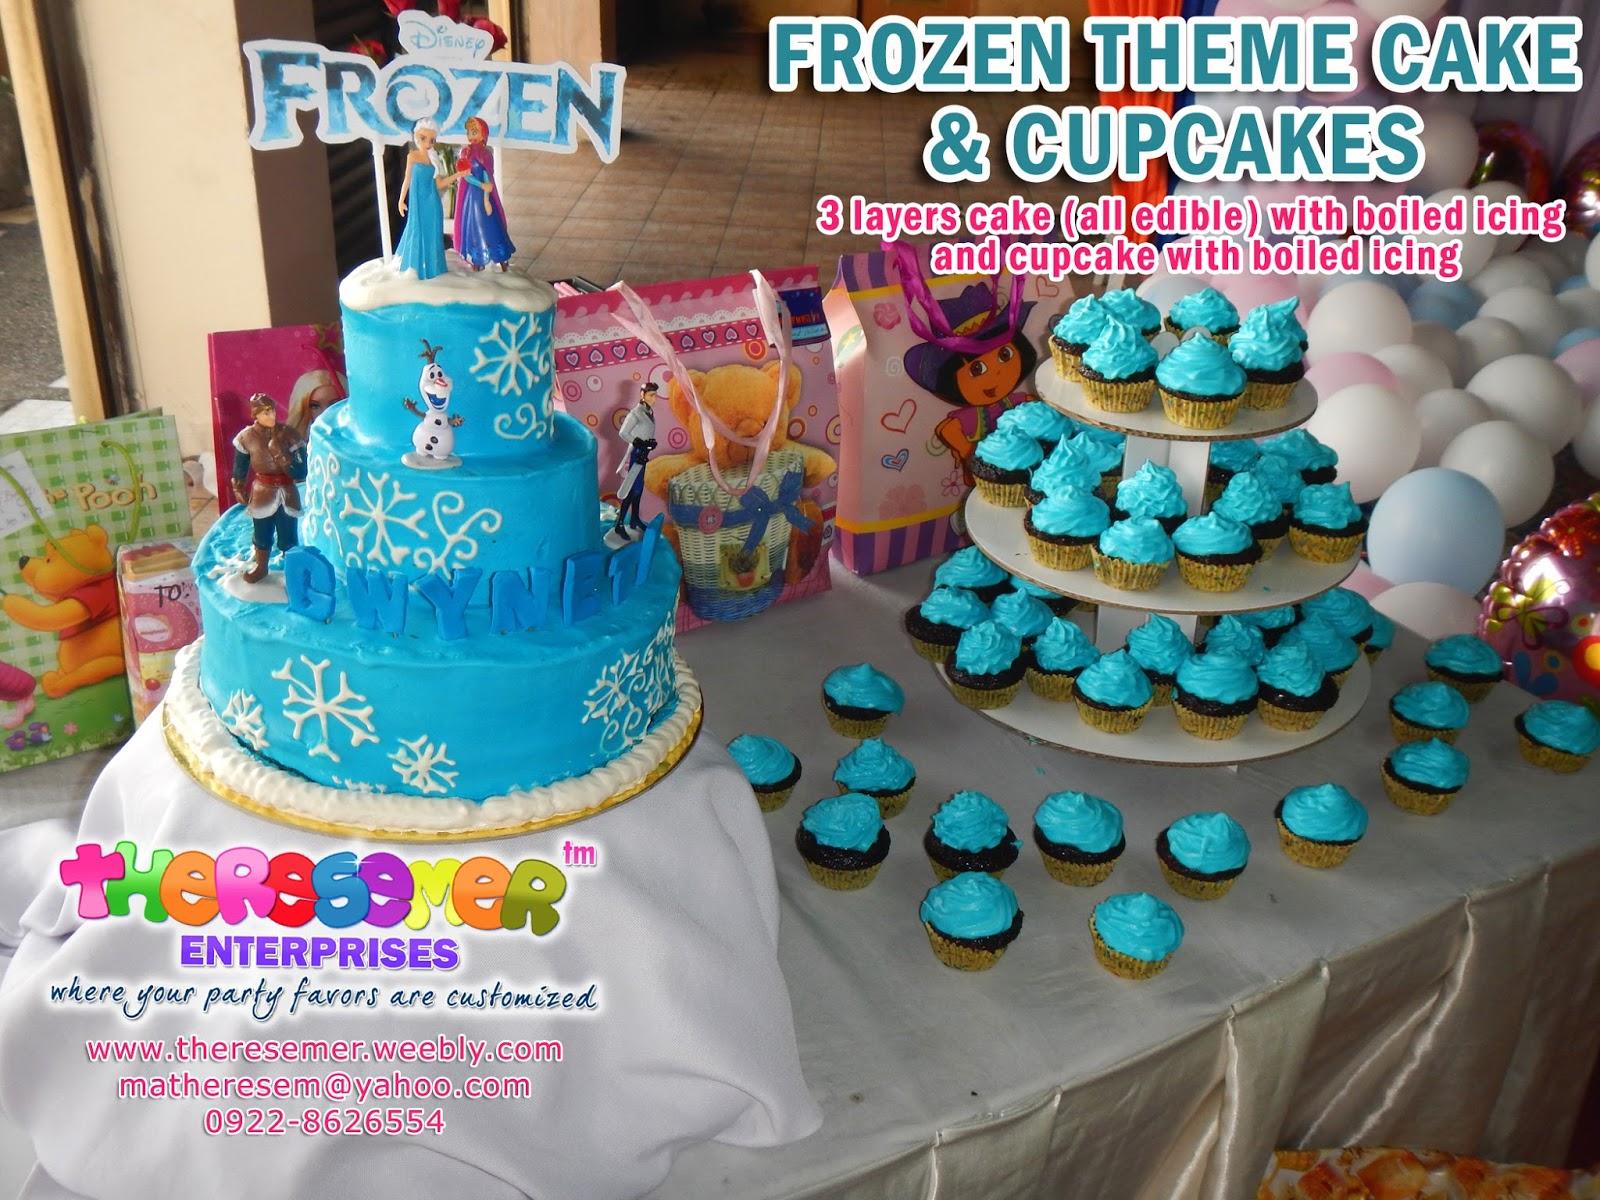 Goldilocks Wedding Cakes Philippines Prices Best Wedding Cake 2018